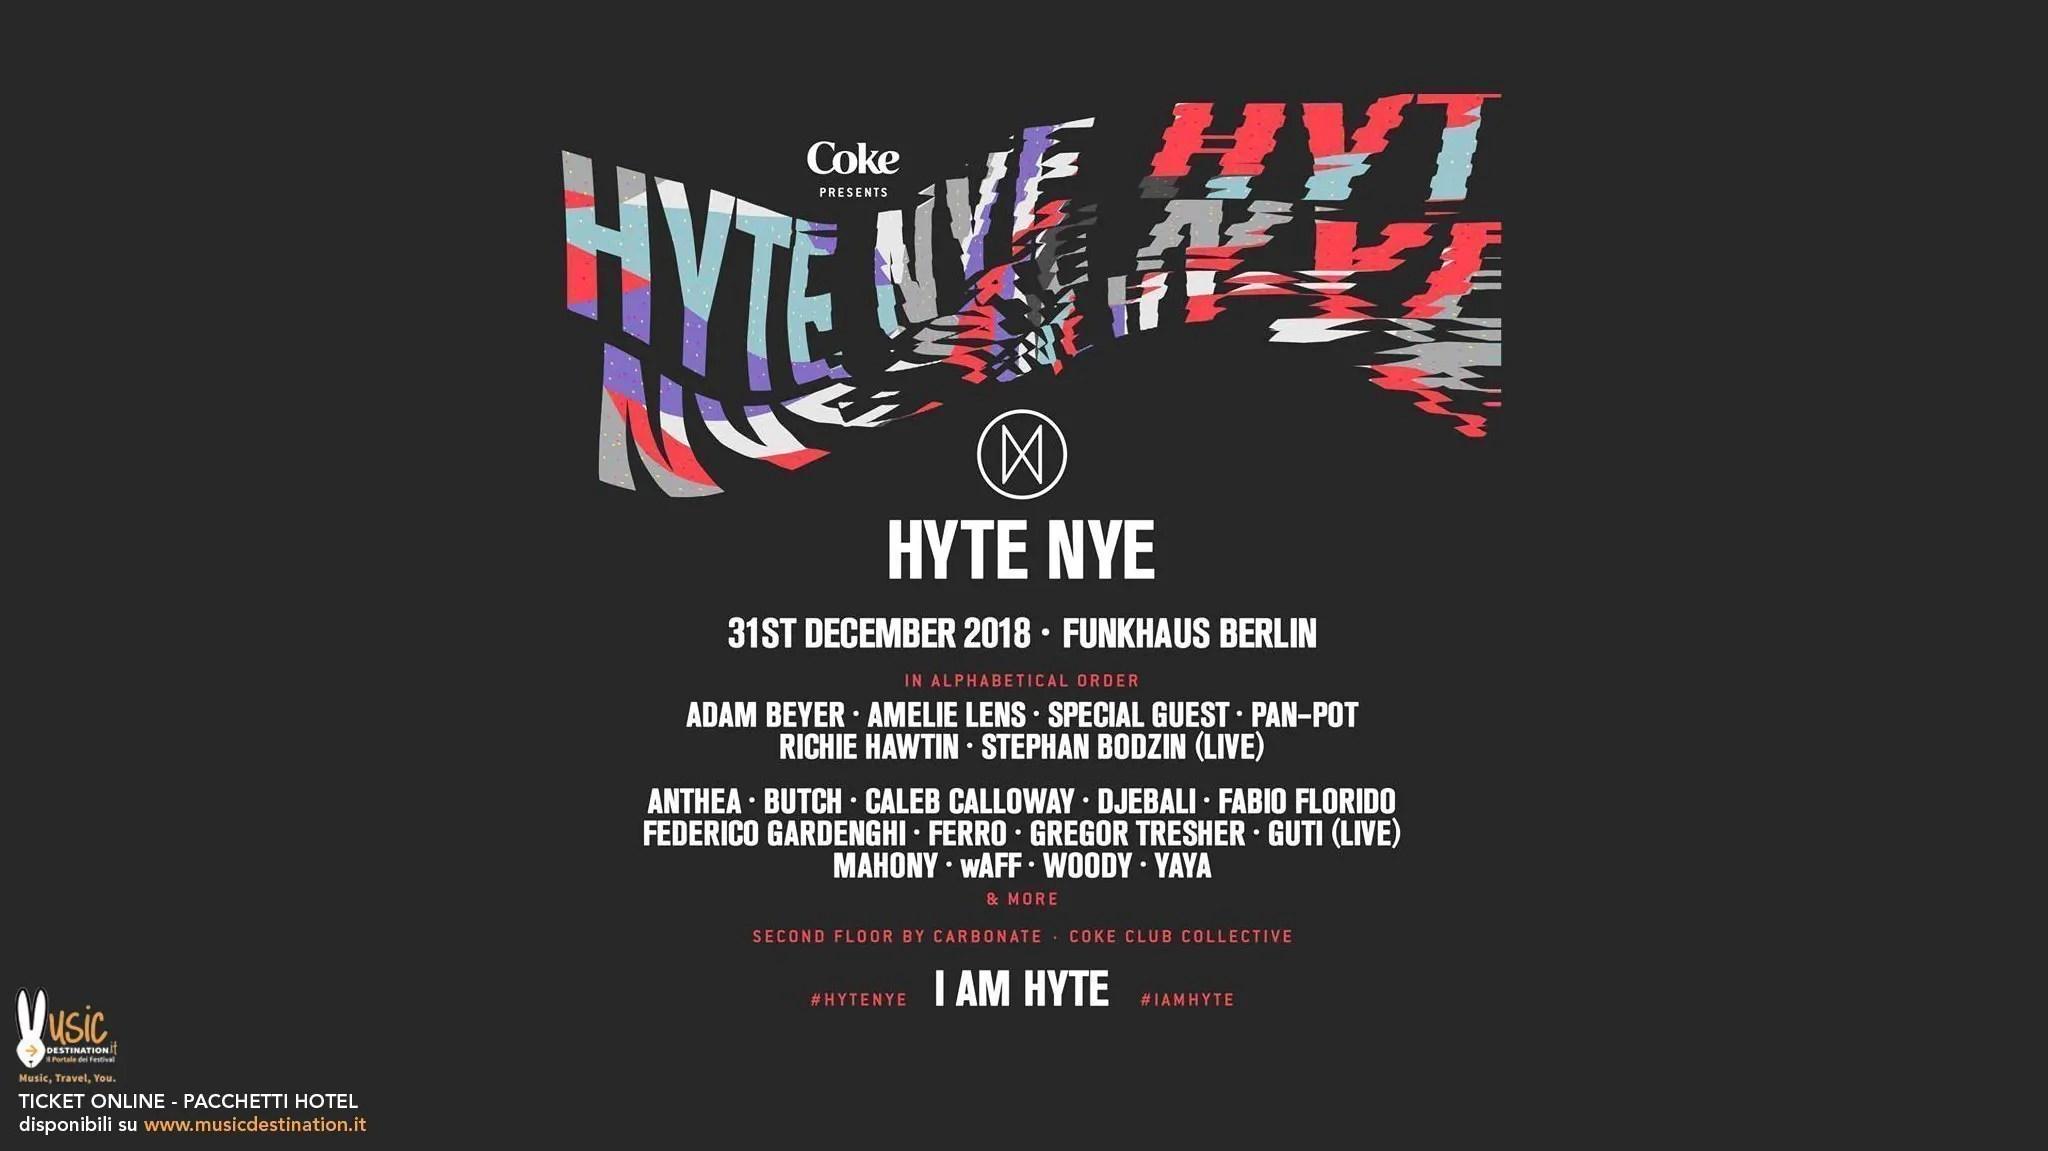 Hyte Berlin NYE 2018/2019 Funkhaus Berlino 31 12 2018 | Ticket + Biglietti + Hotel + Viaggio